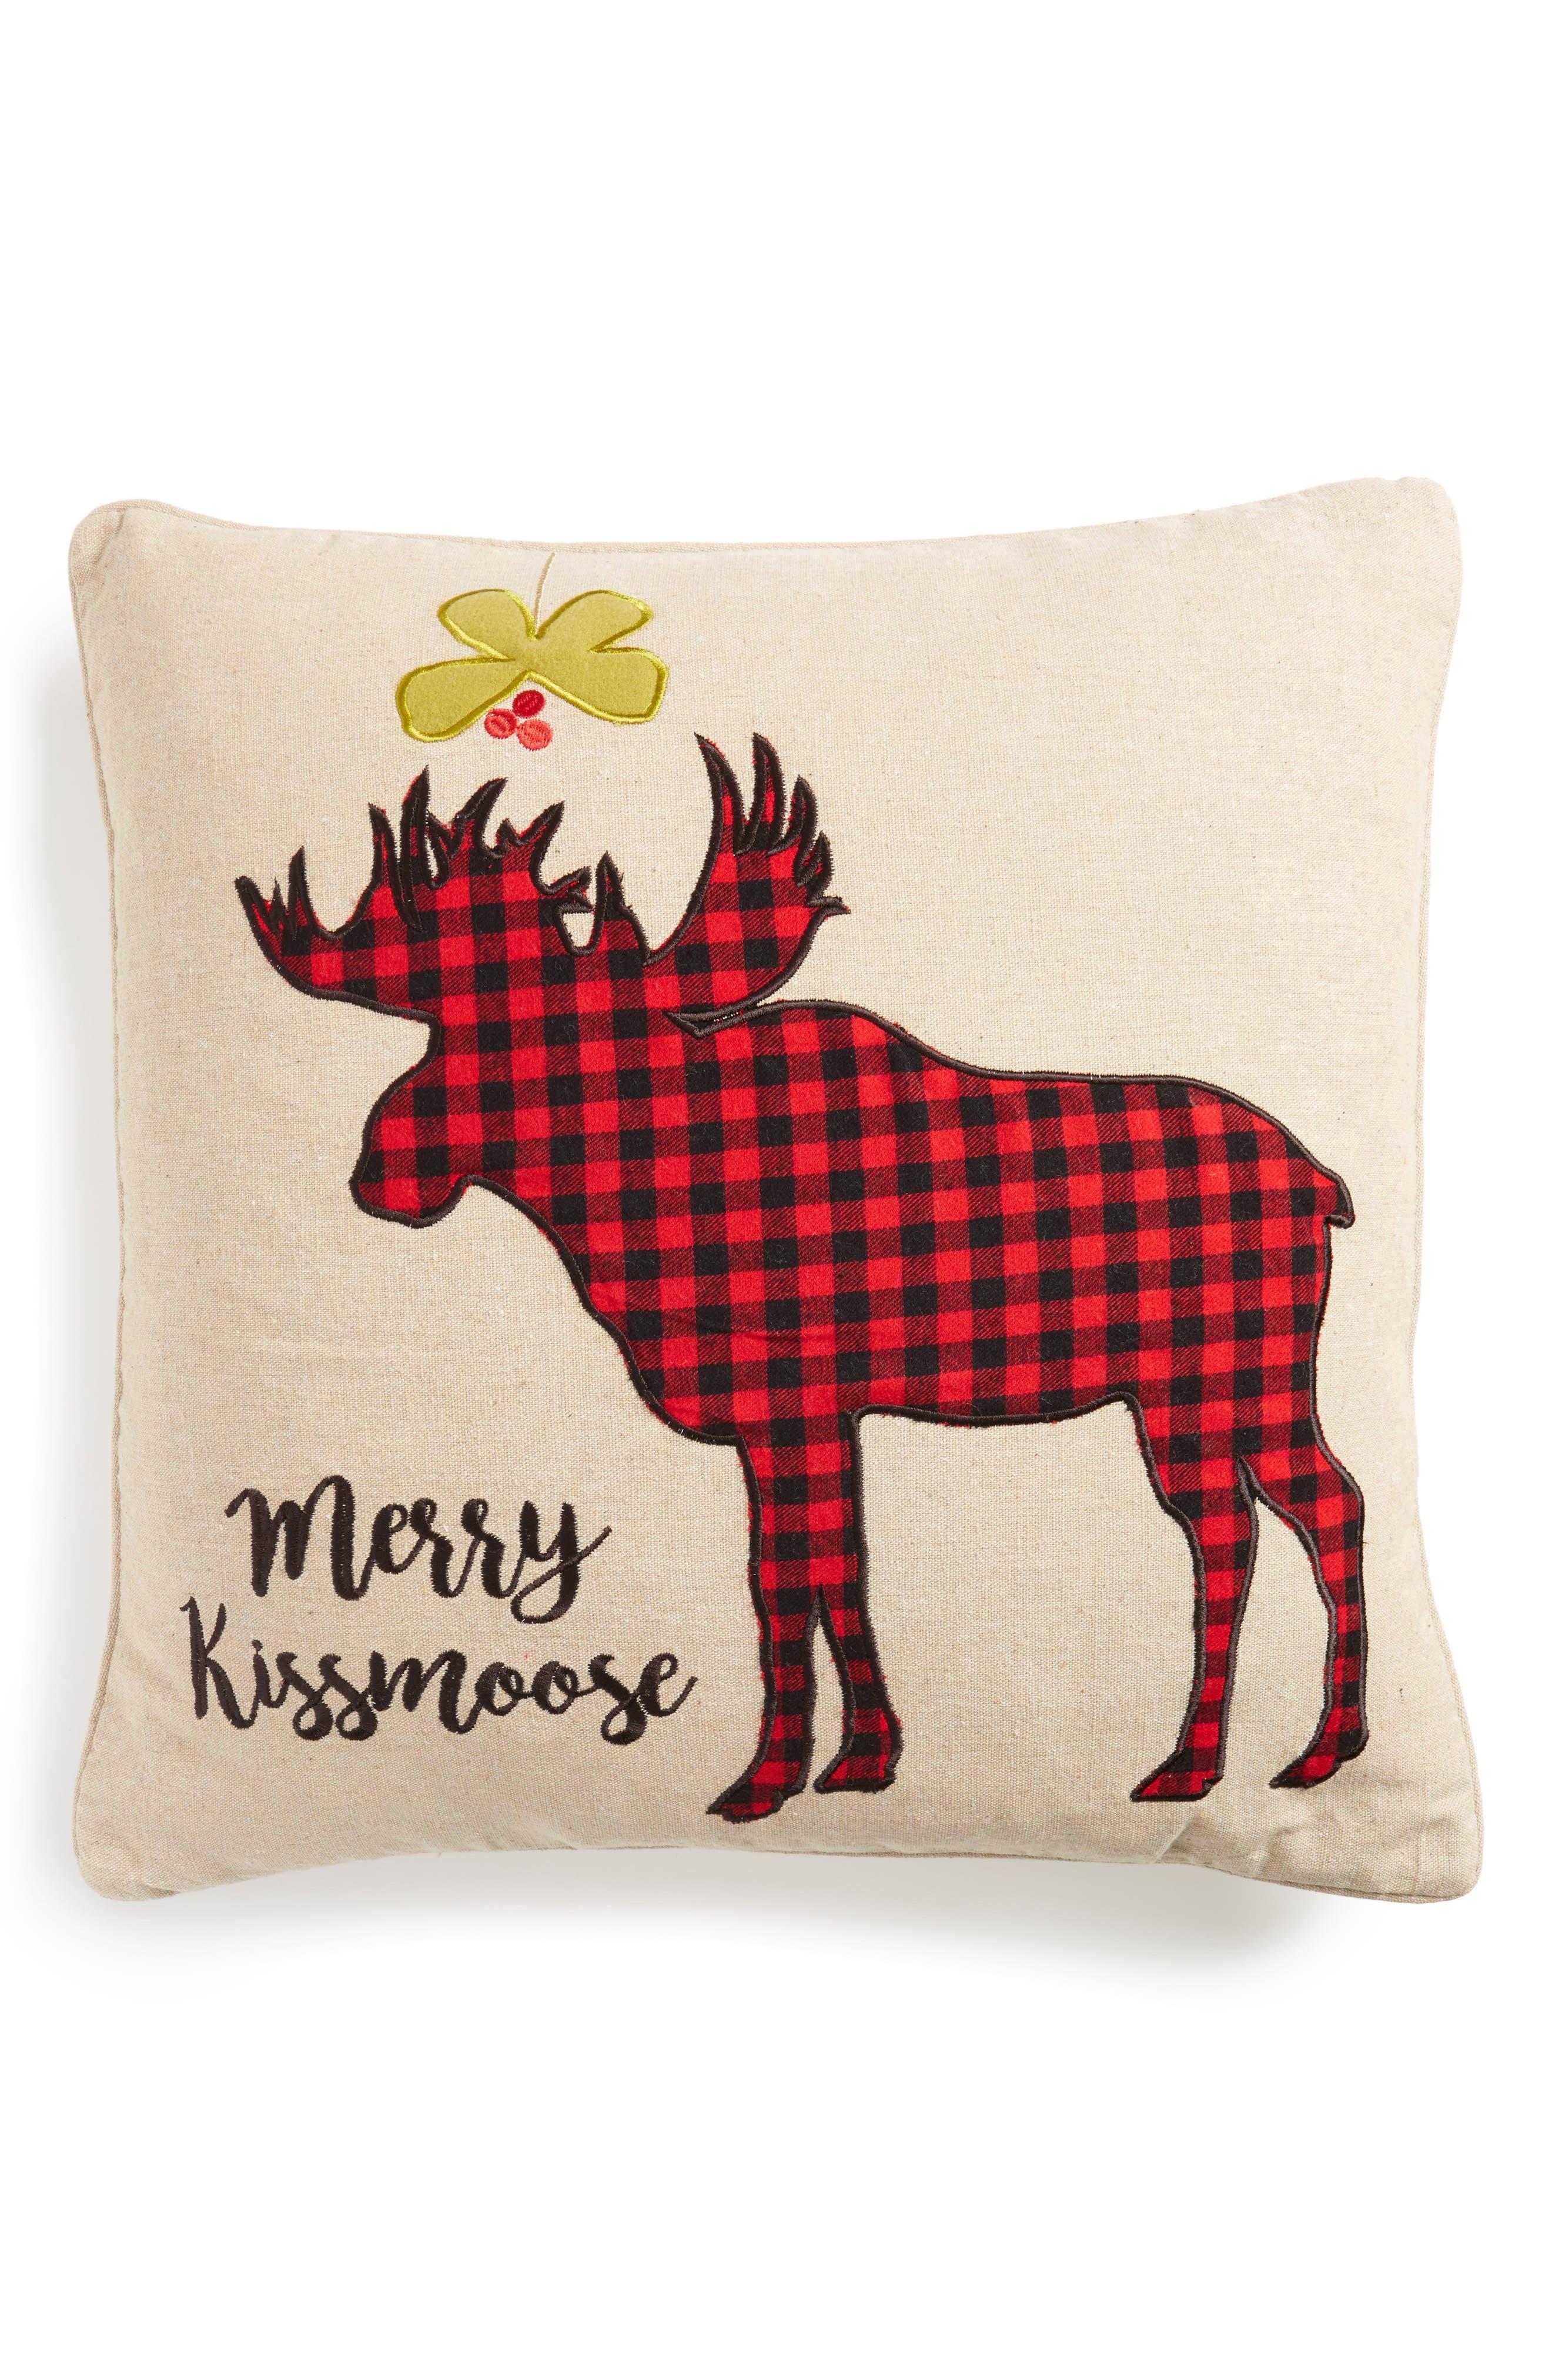 Levtex Plaid Merry Kissmoose Accent Pillow